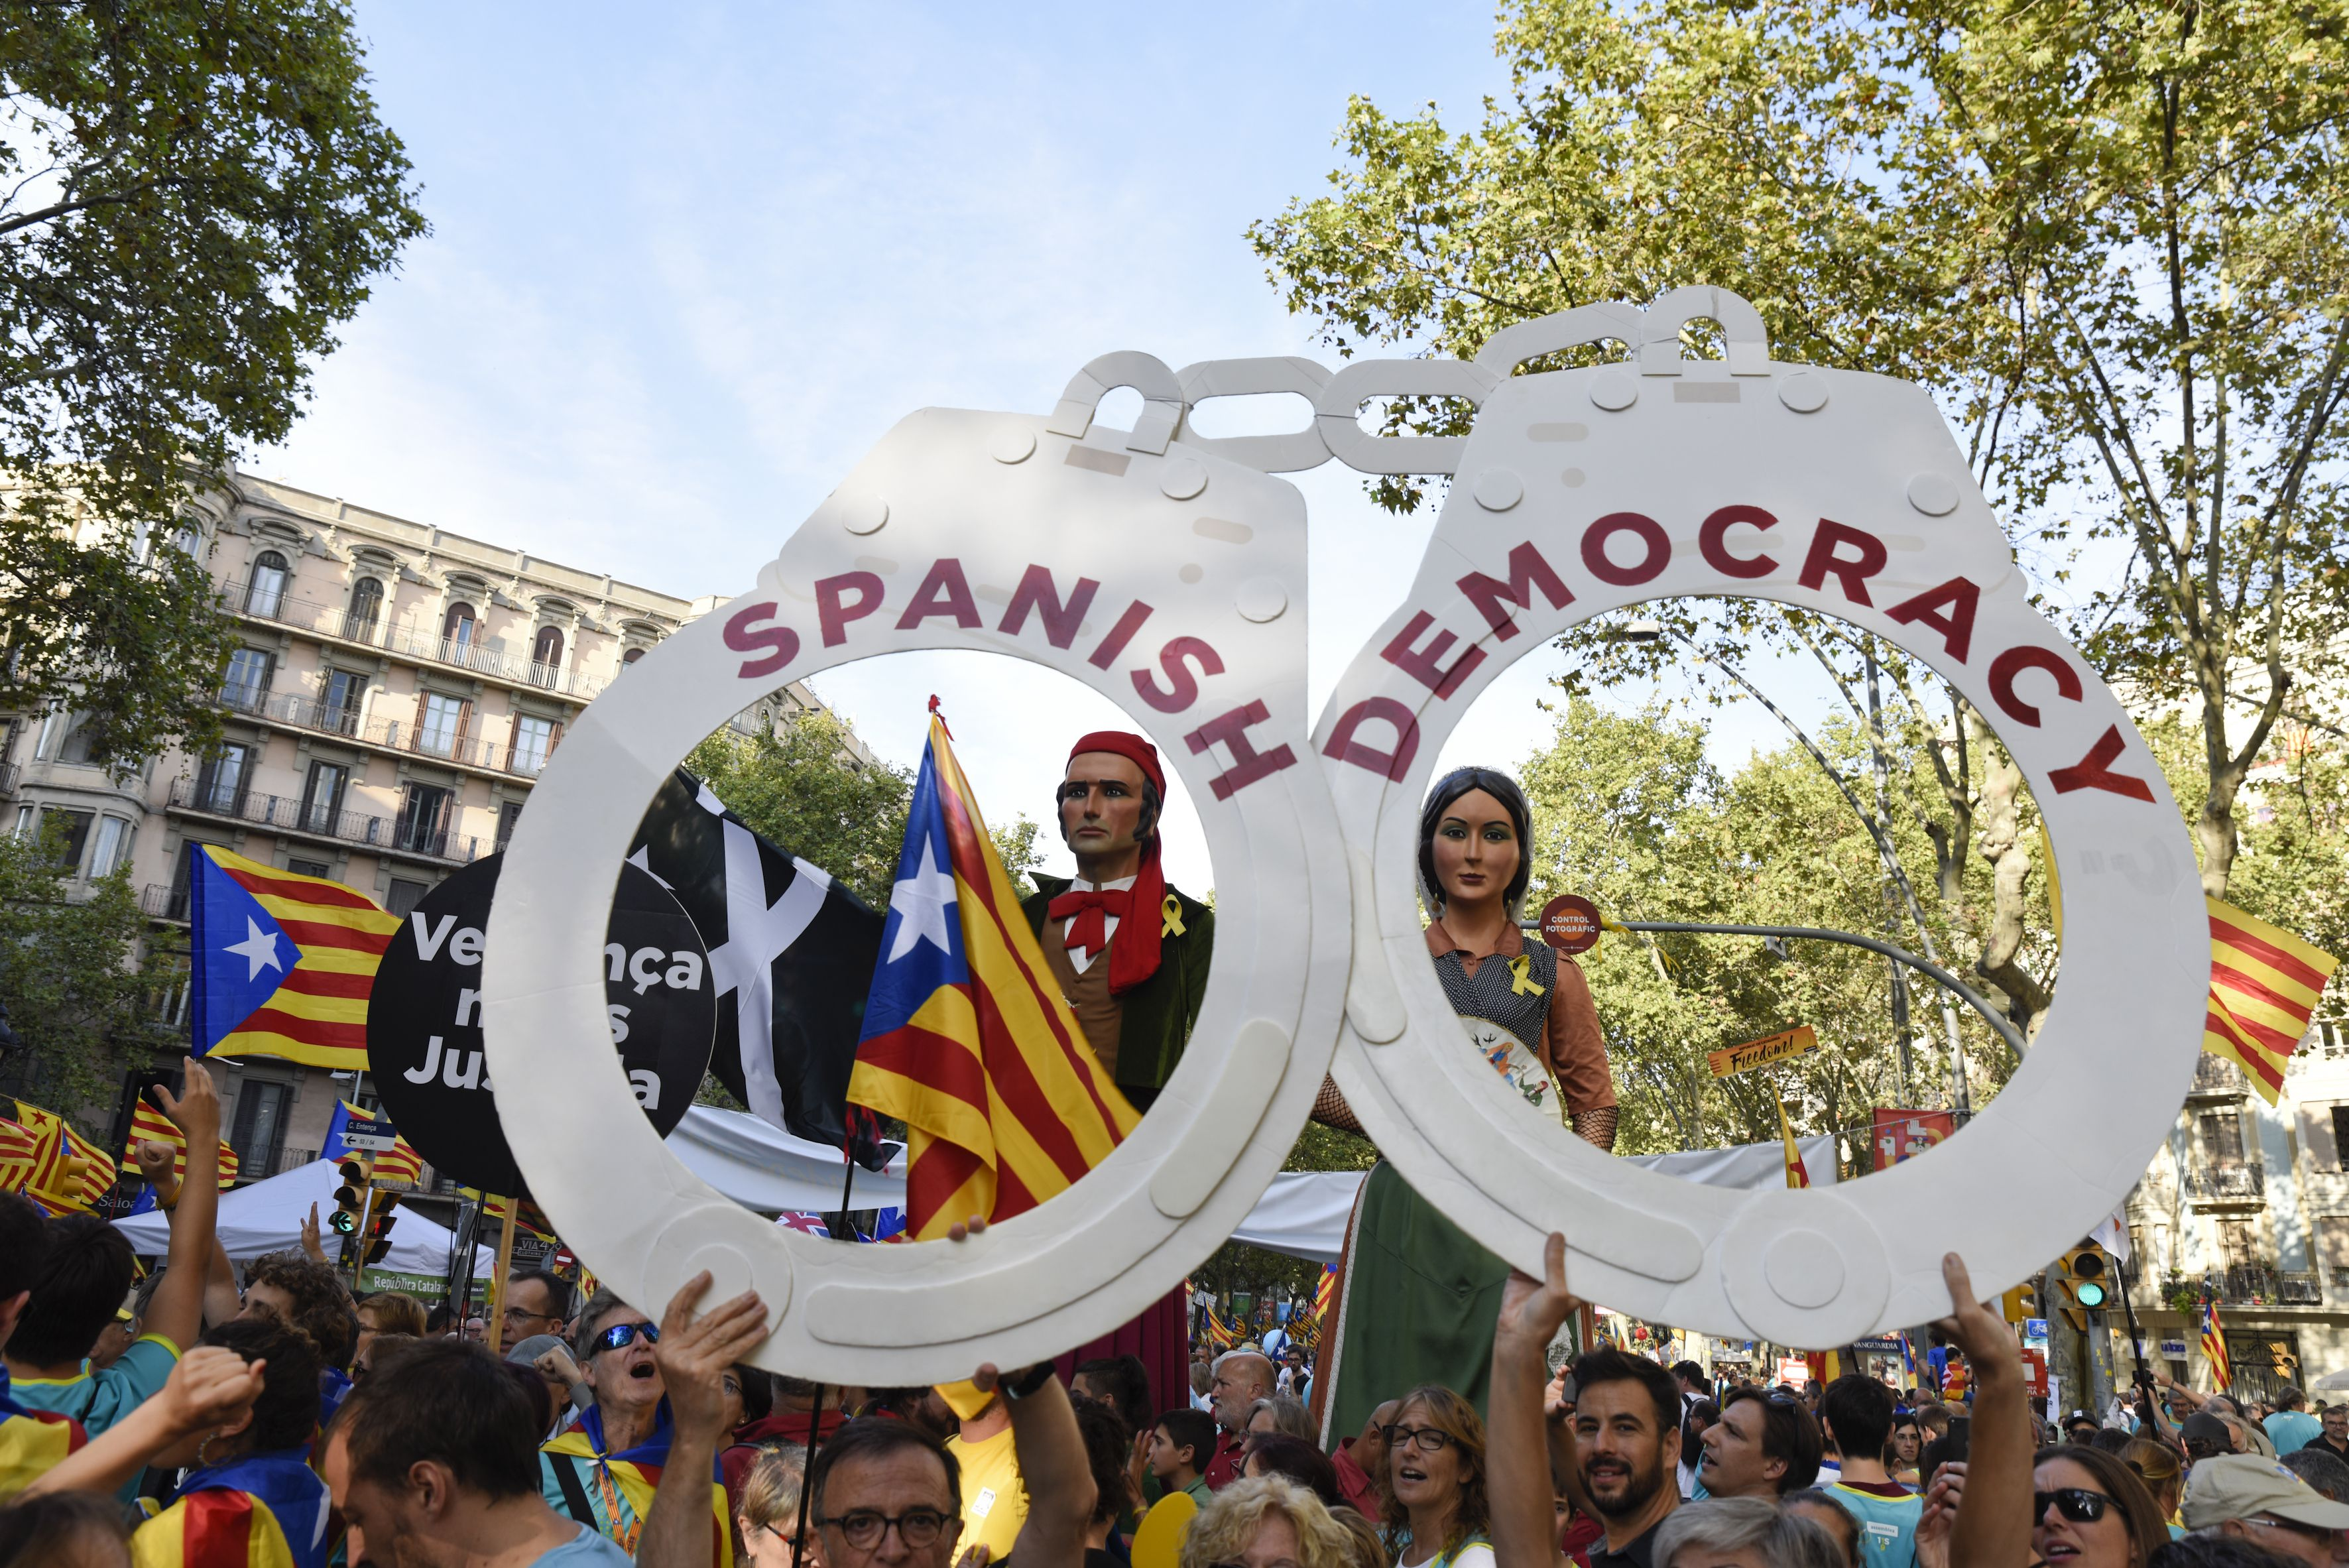 diada nacional catalana 11 setembre barcelona 58